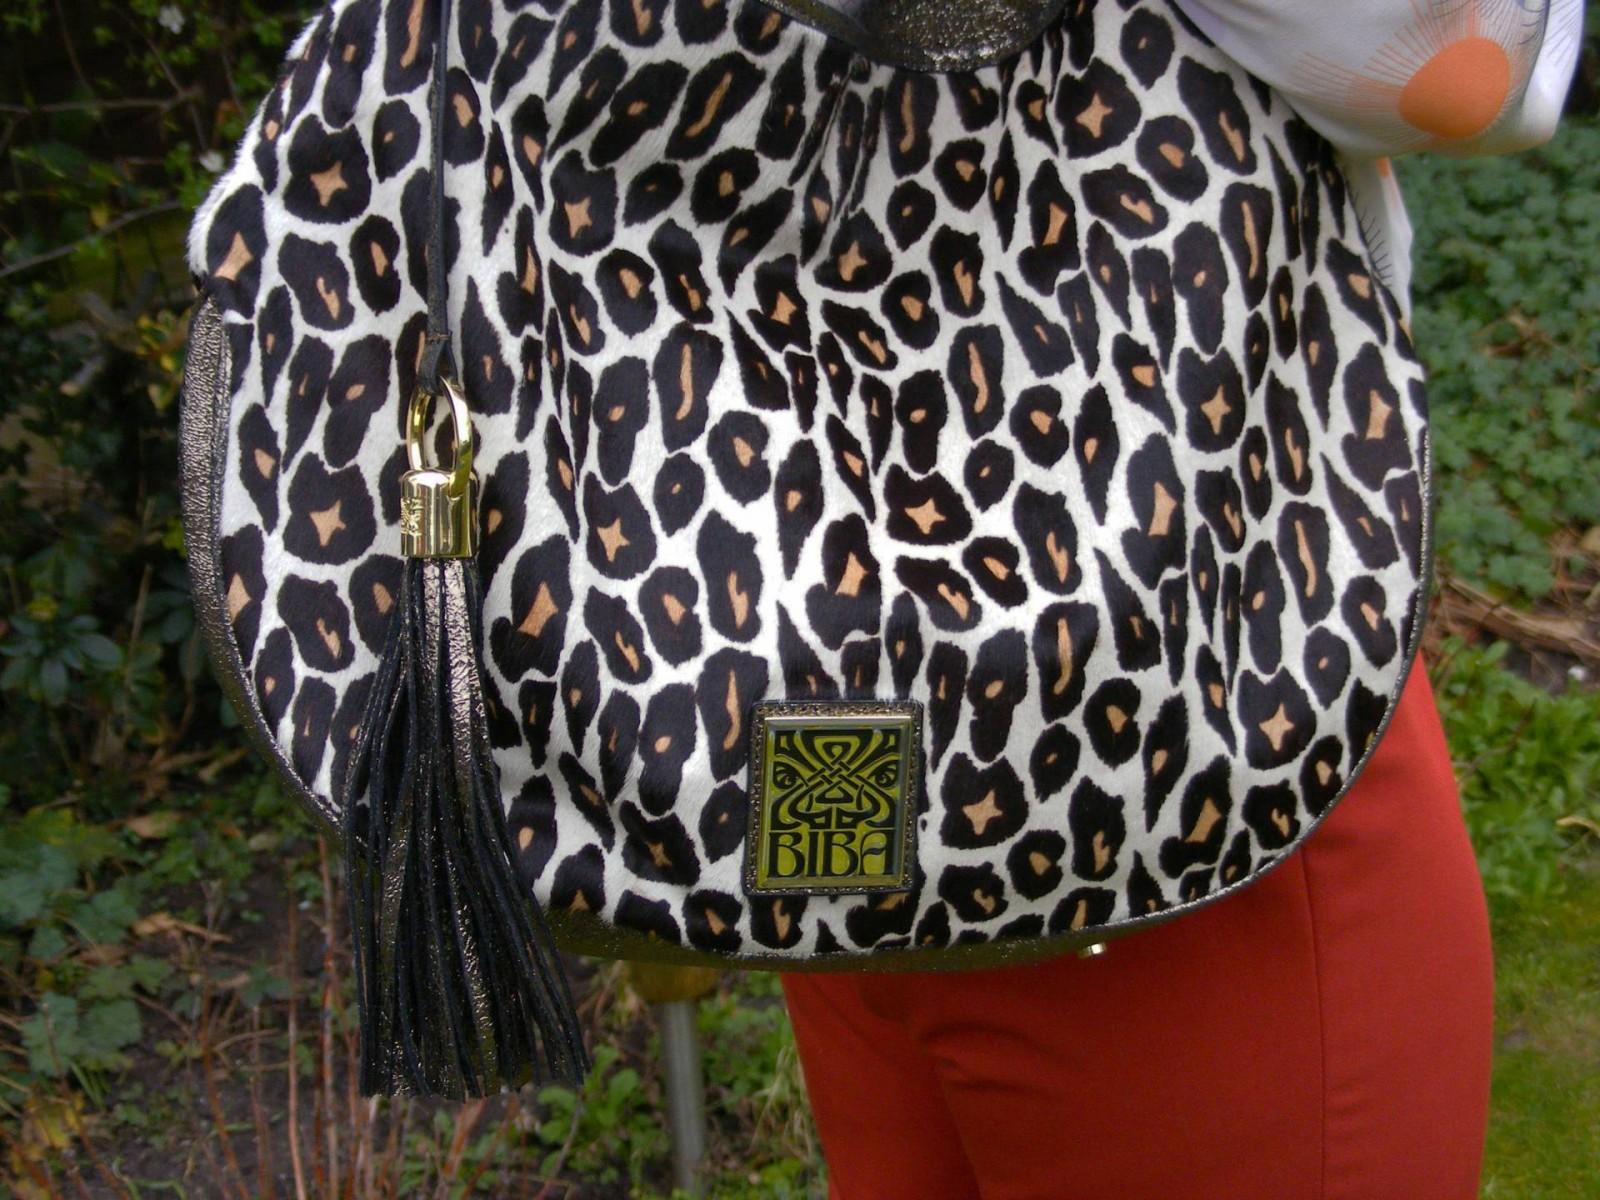 Biba leopard print handbag